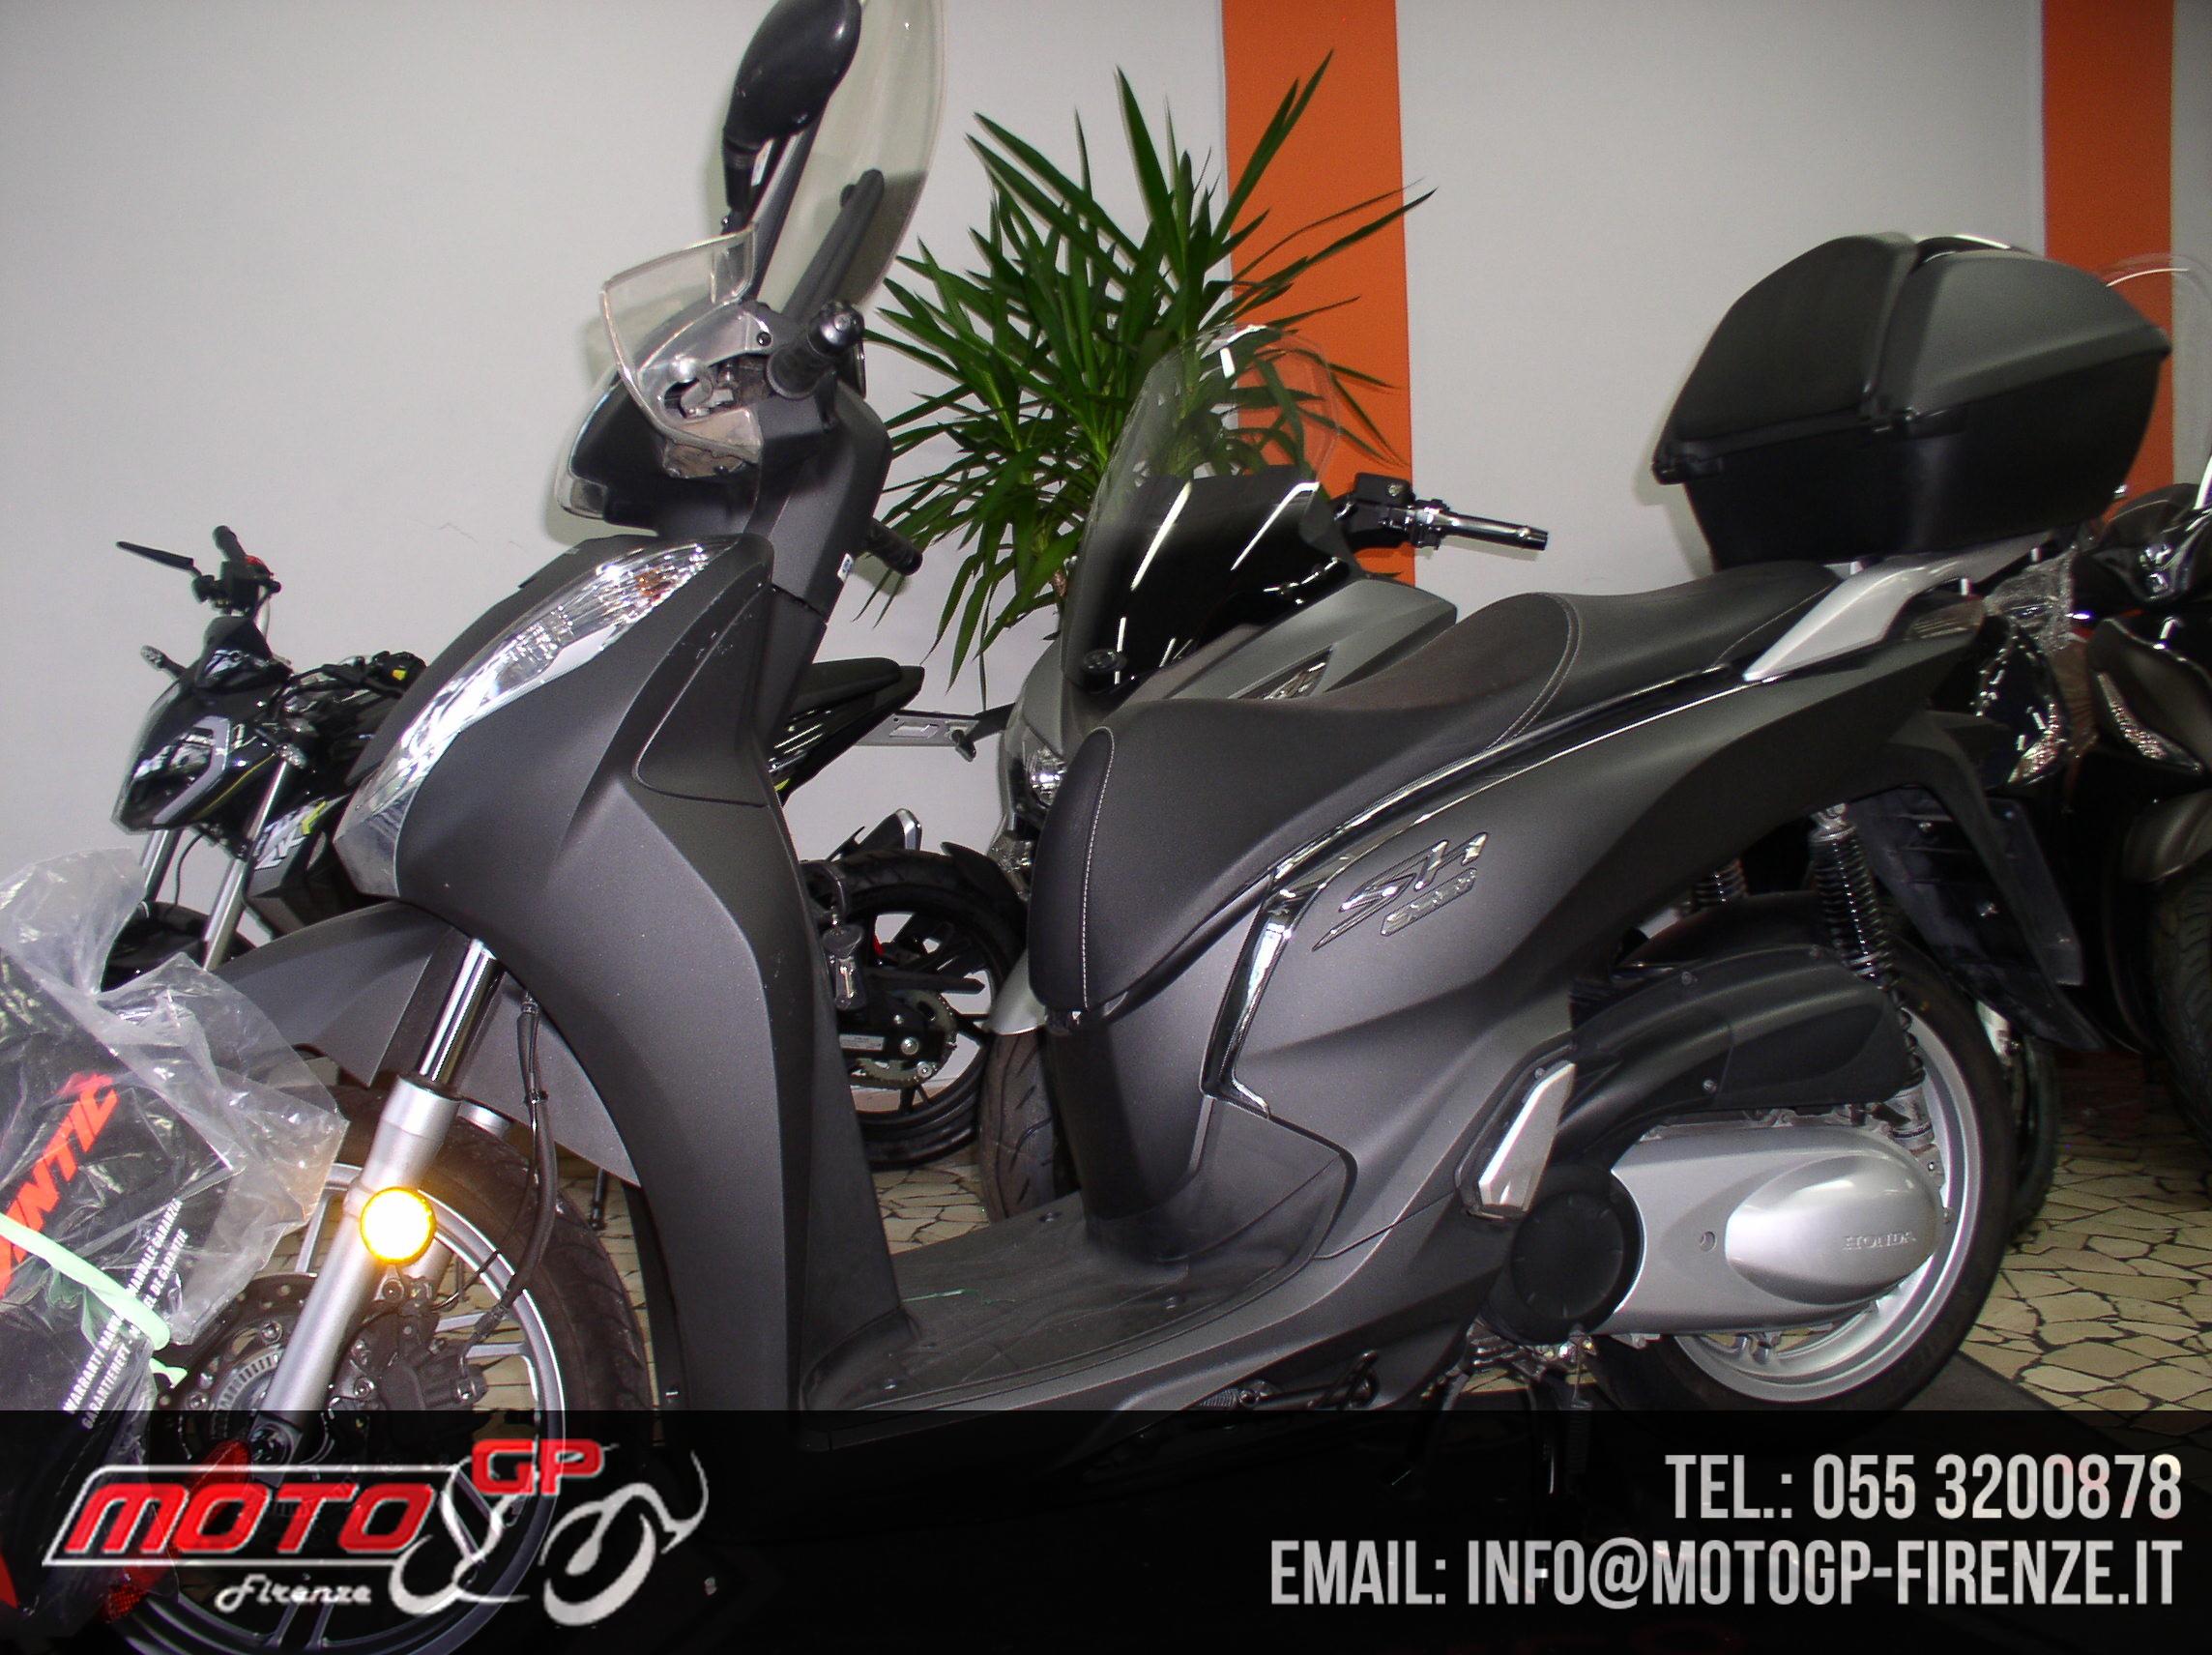 Honda Sh 300 I Abs Motogp Moto Usate E Nuove A Firenze